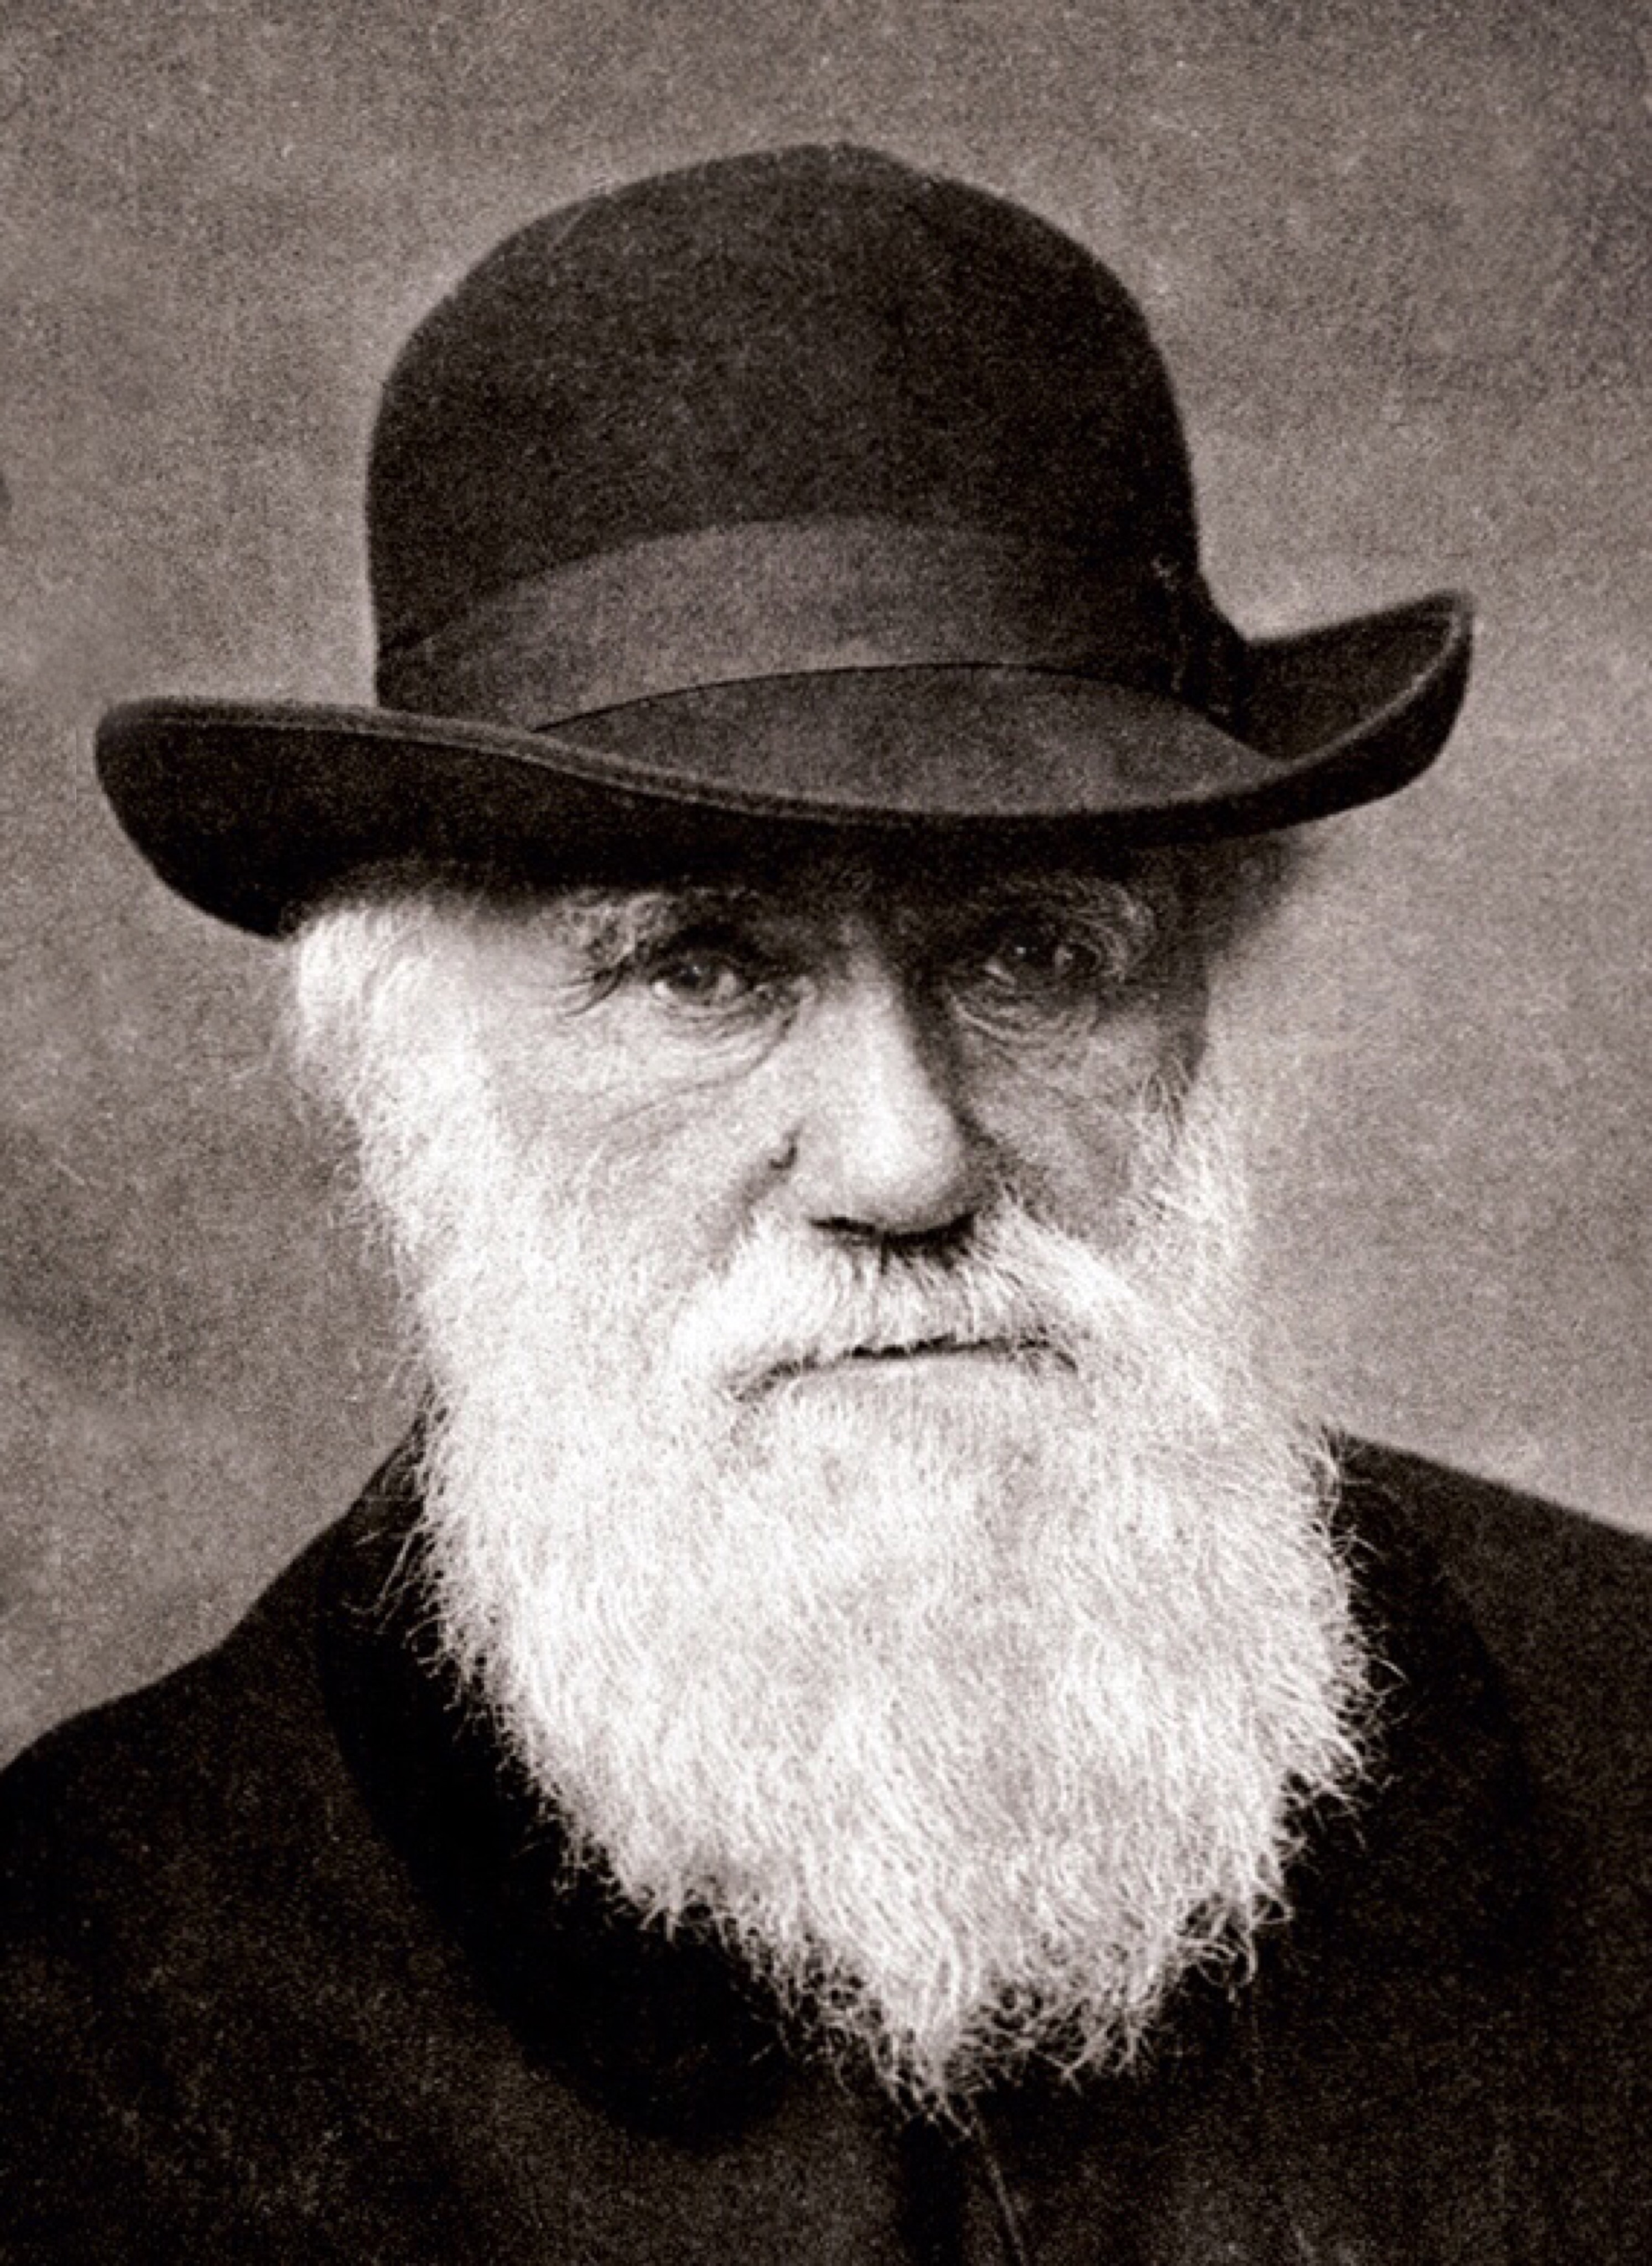 Depiction of Darwinismo